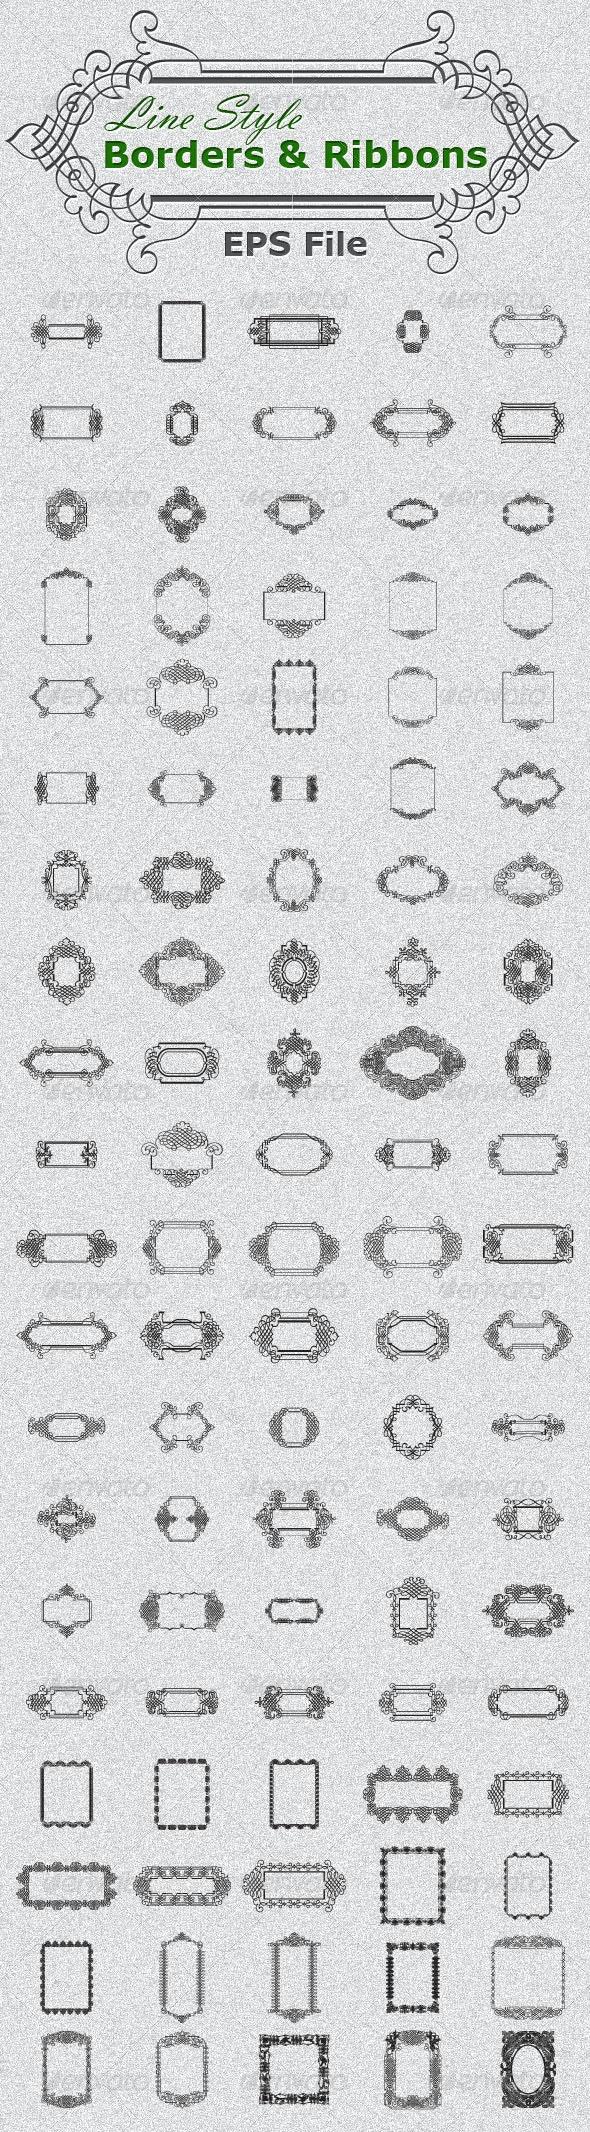 Mega Border & Ribbons Collection (Line Style) - Borders Decorative